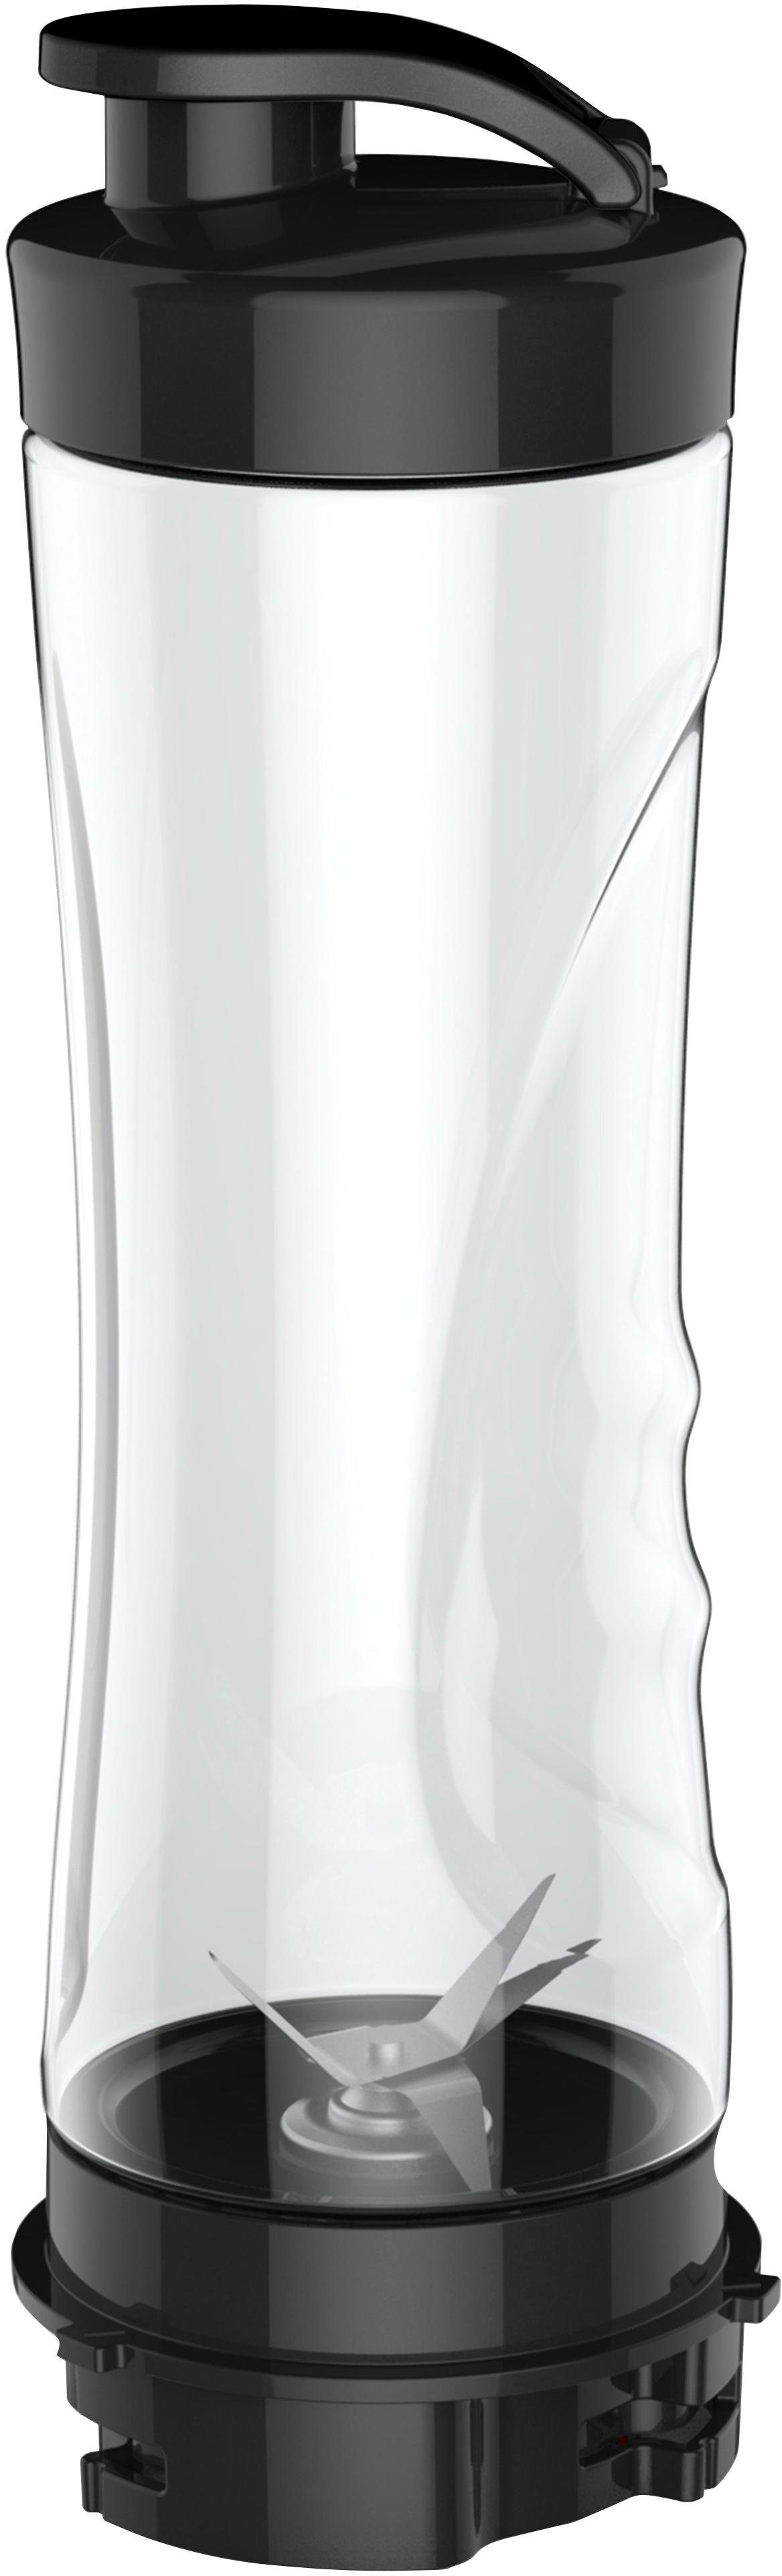 CASO Trinkflasche CASO Single Serve 3613, Zubehör für CASO NOVEA B4